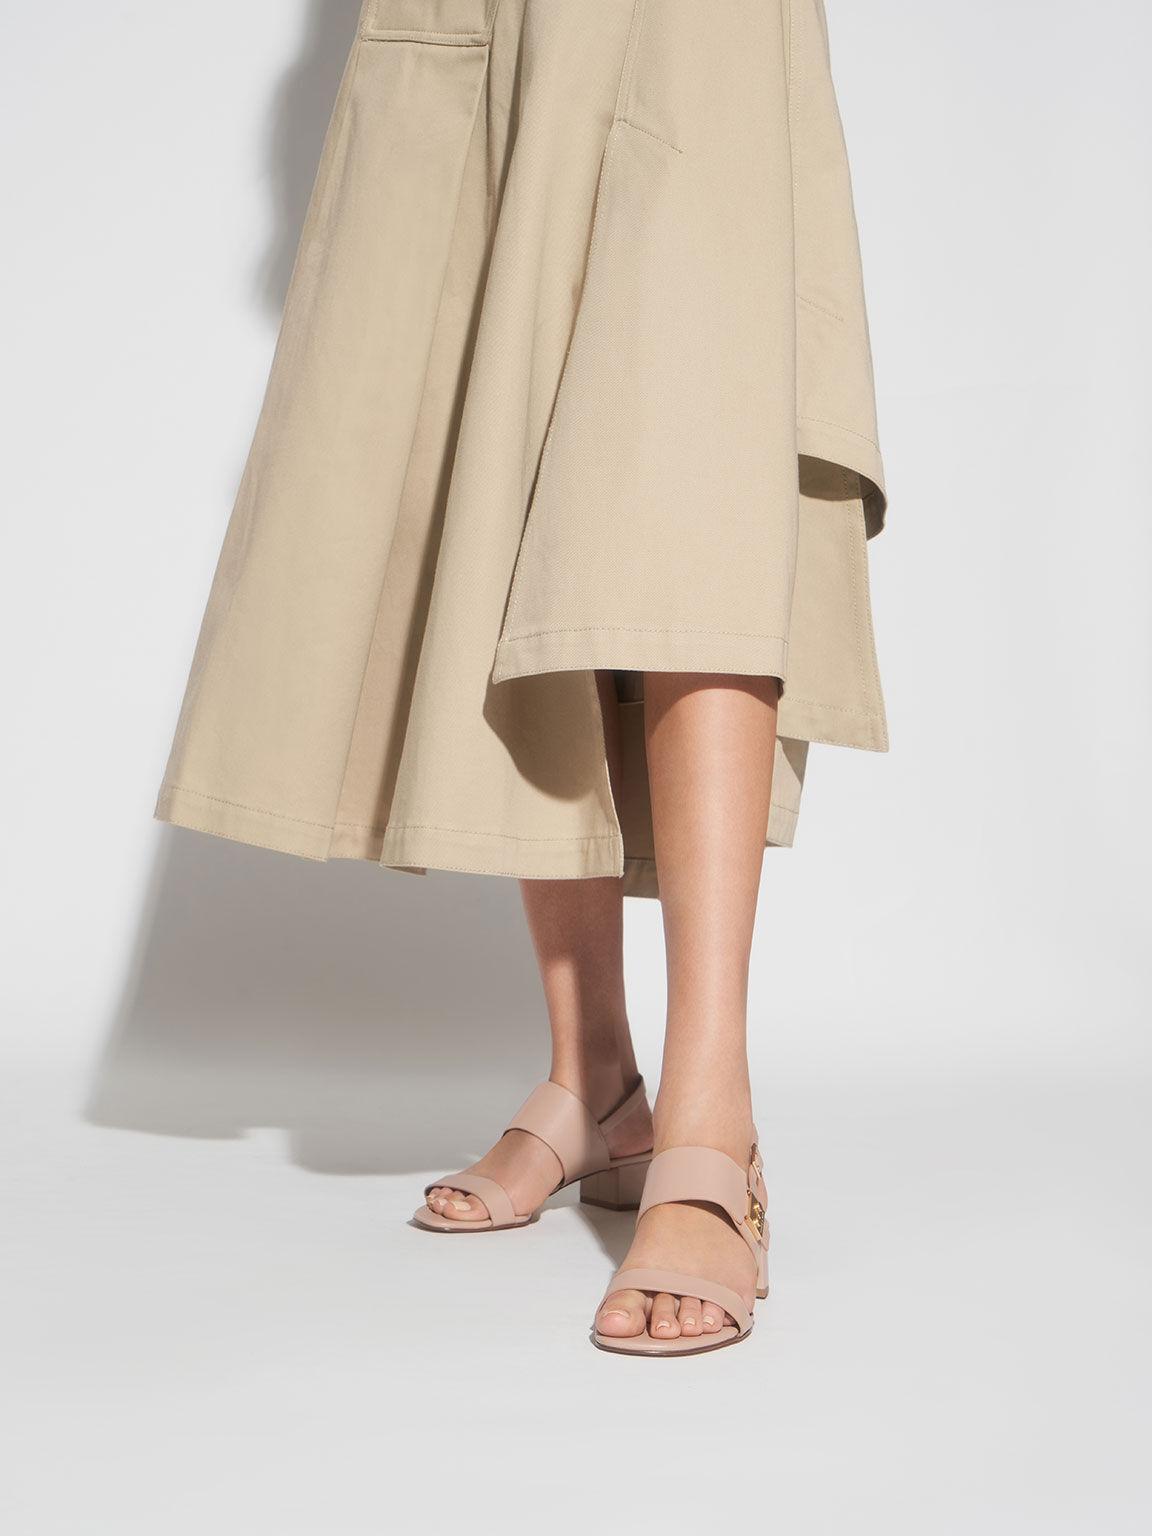 Buckle Strap Sandals, Nude, hi-res